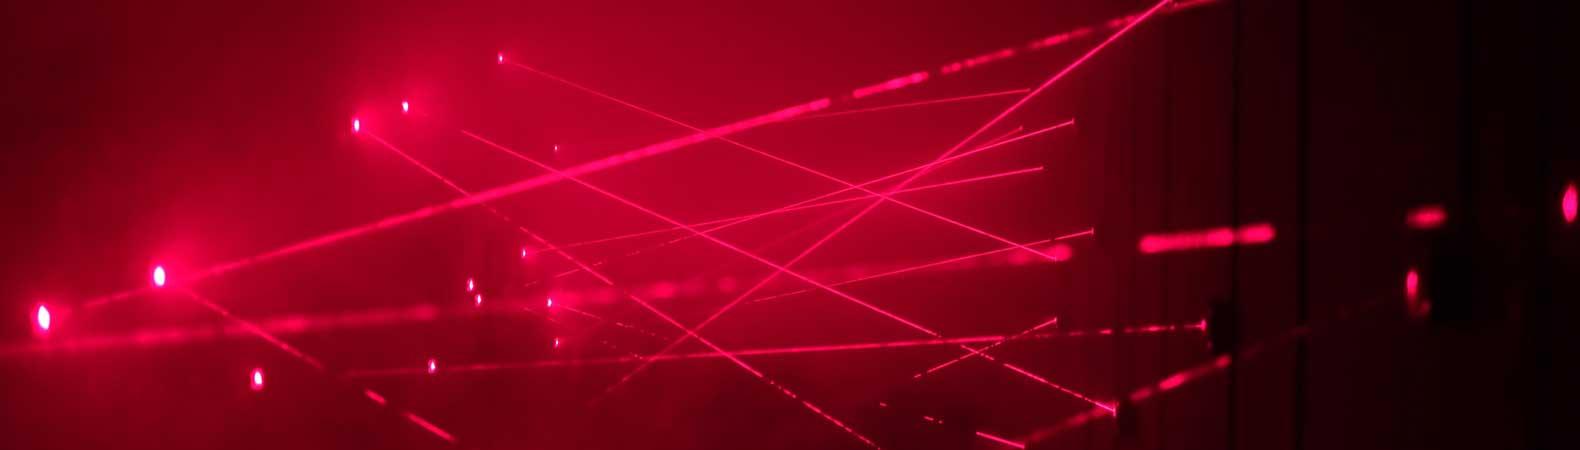 laser spy